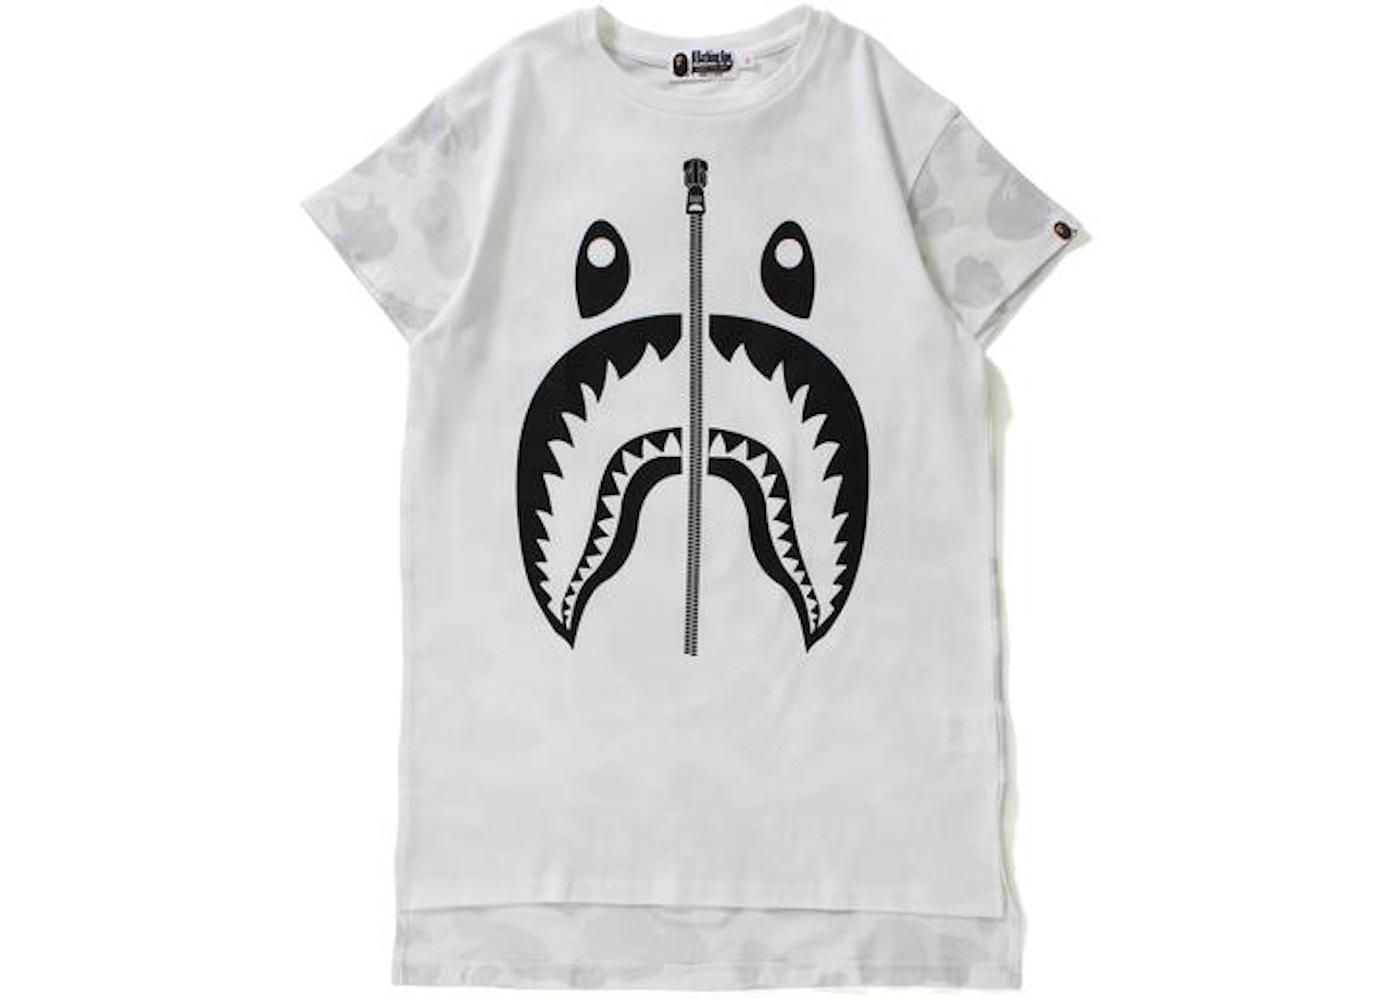 c4894ba9 BAPE City Camo Shark Long Length Tee Tee (Ladies) White -